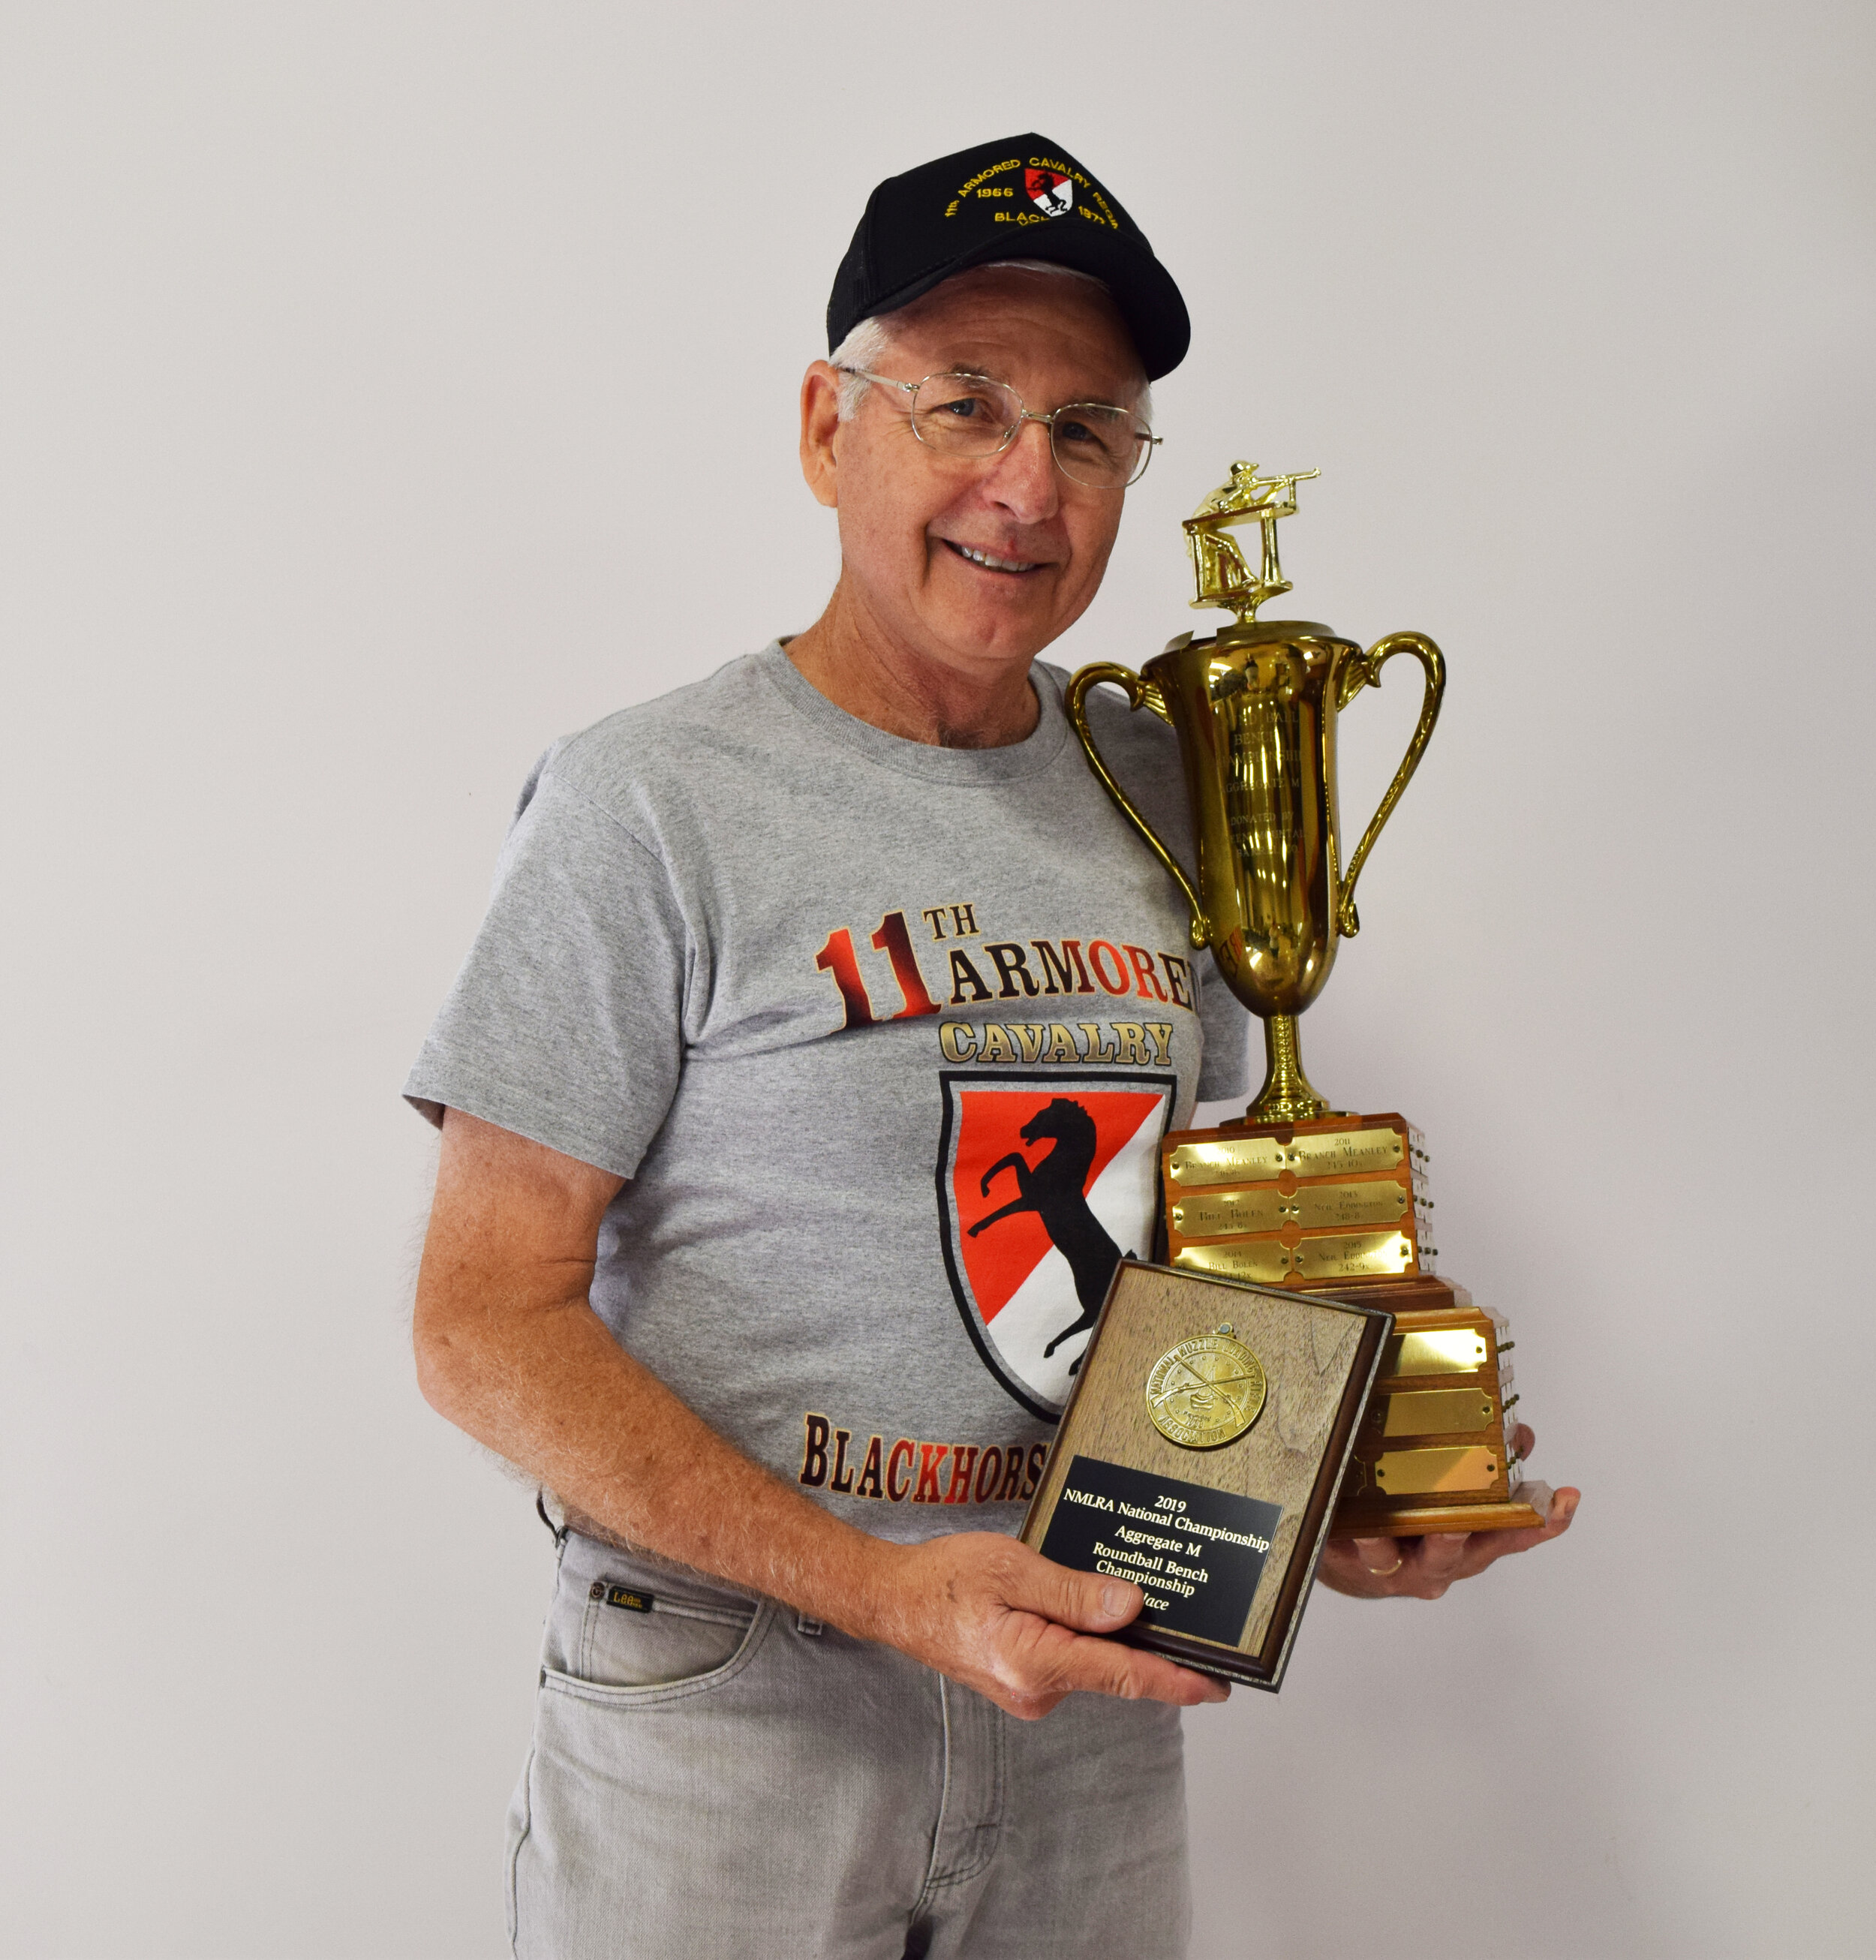 Robert Dickson - Aggregate M - Roundball Bench Championship Winner